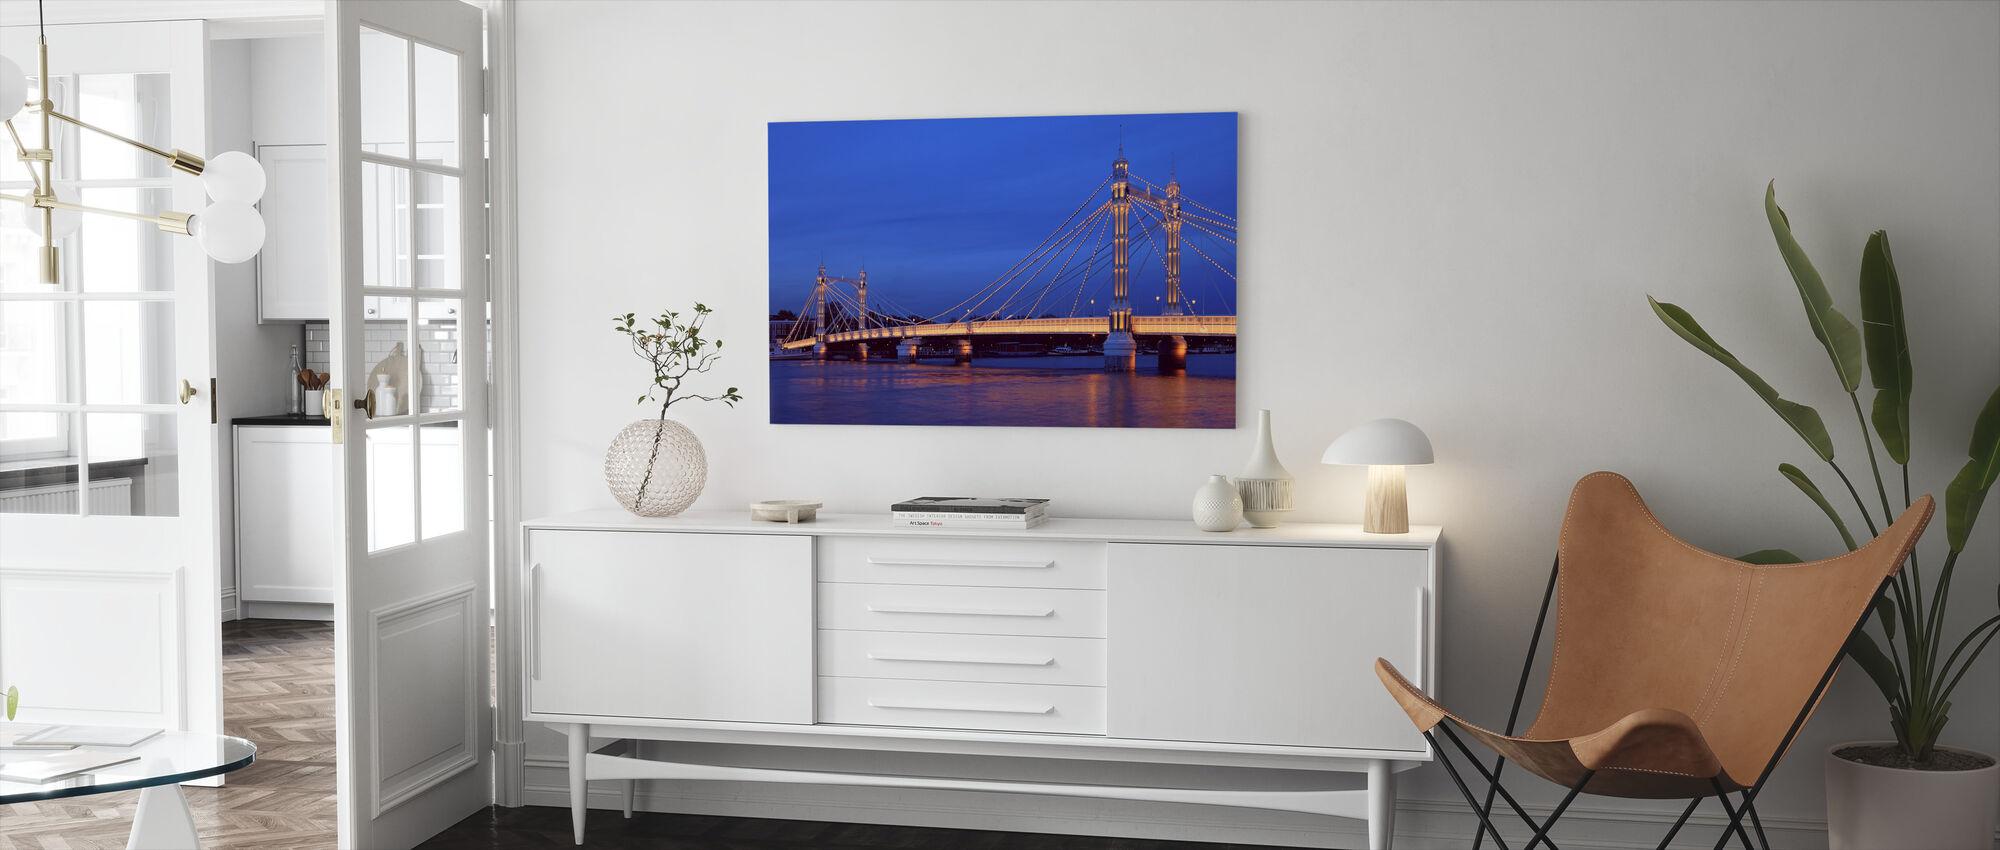 Albert Bridge in London Illuminated - Canvas print - Living Room